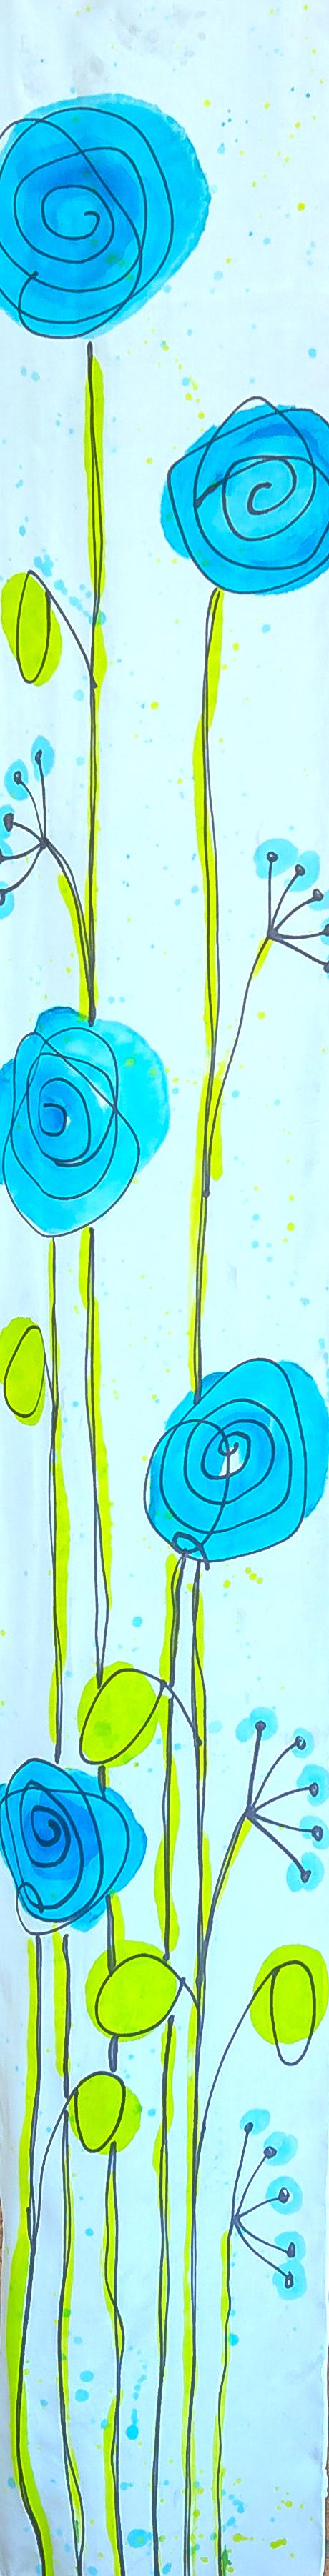 "Blue Poppies 8""x54"" $75"